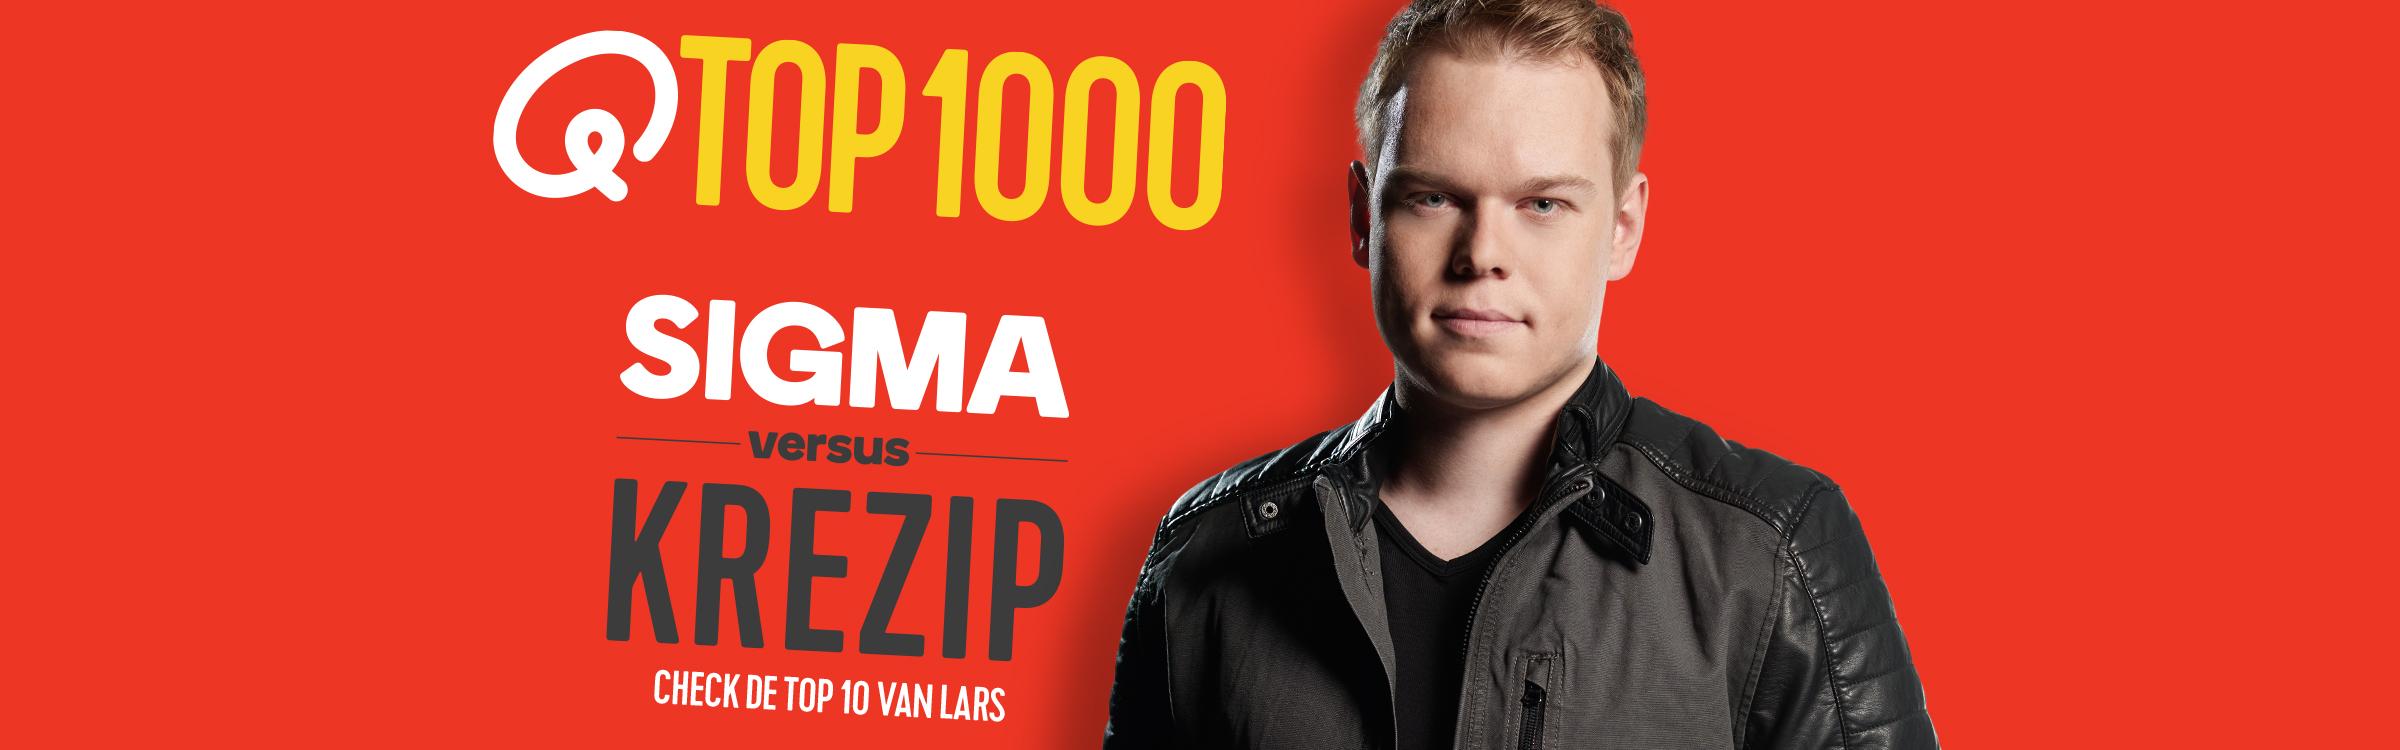 Qmusic actionheader top1000 djs lars